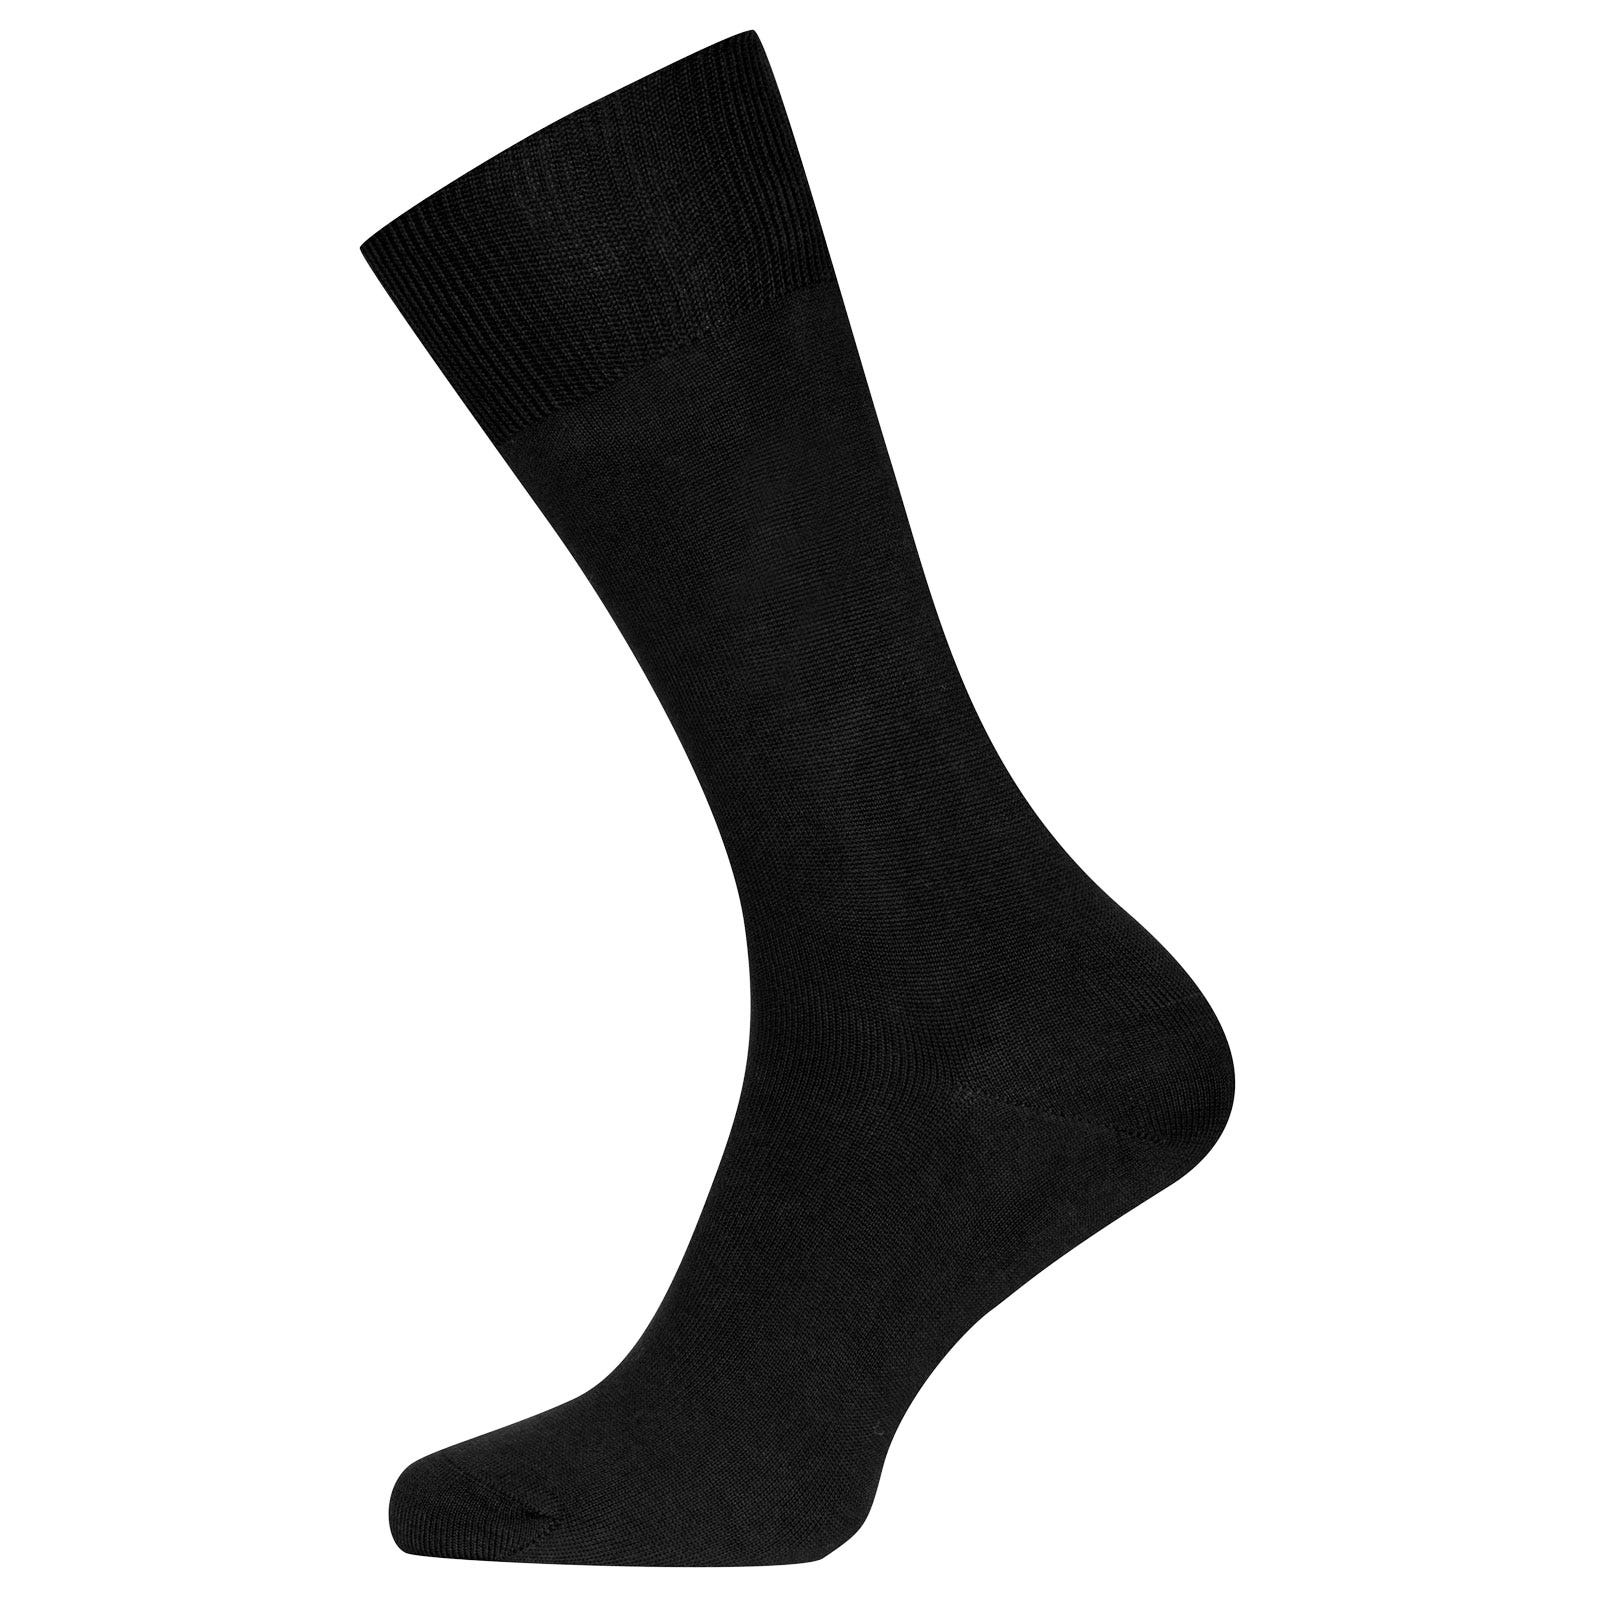 John Smedley Sigma Sea Island Cotton Socks in Black-S/M